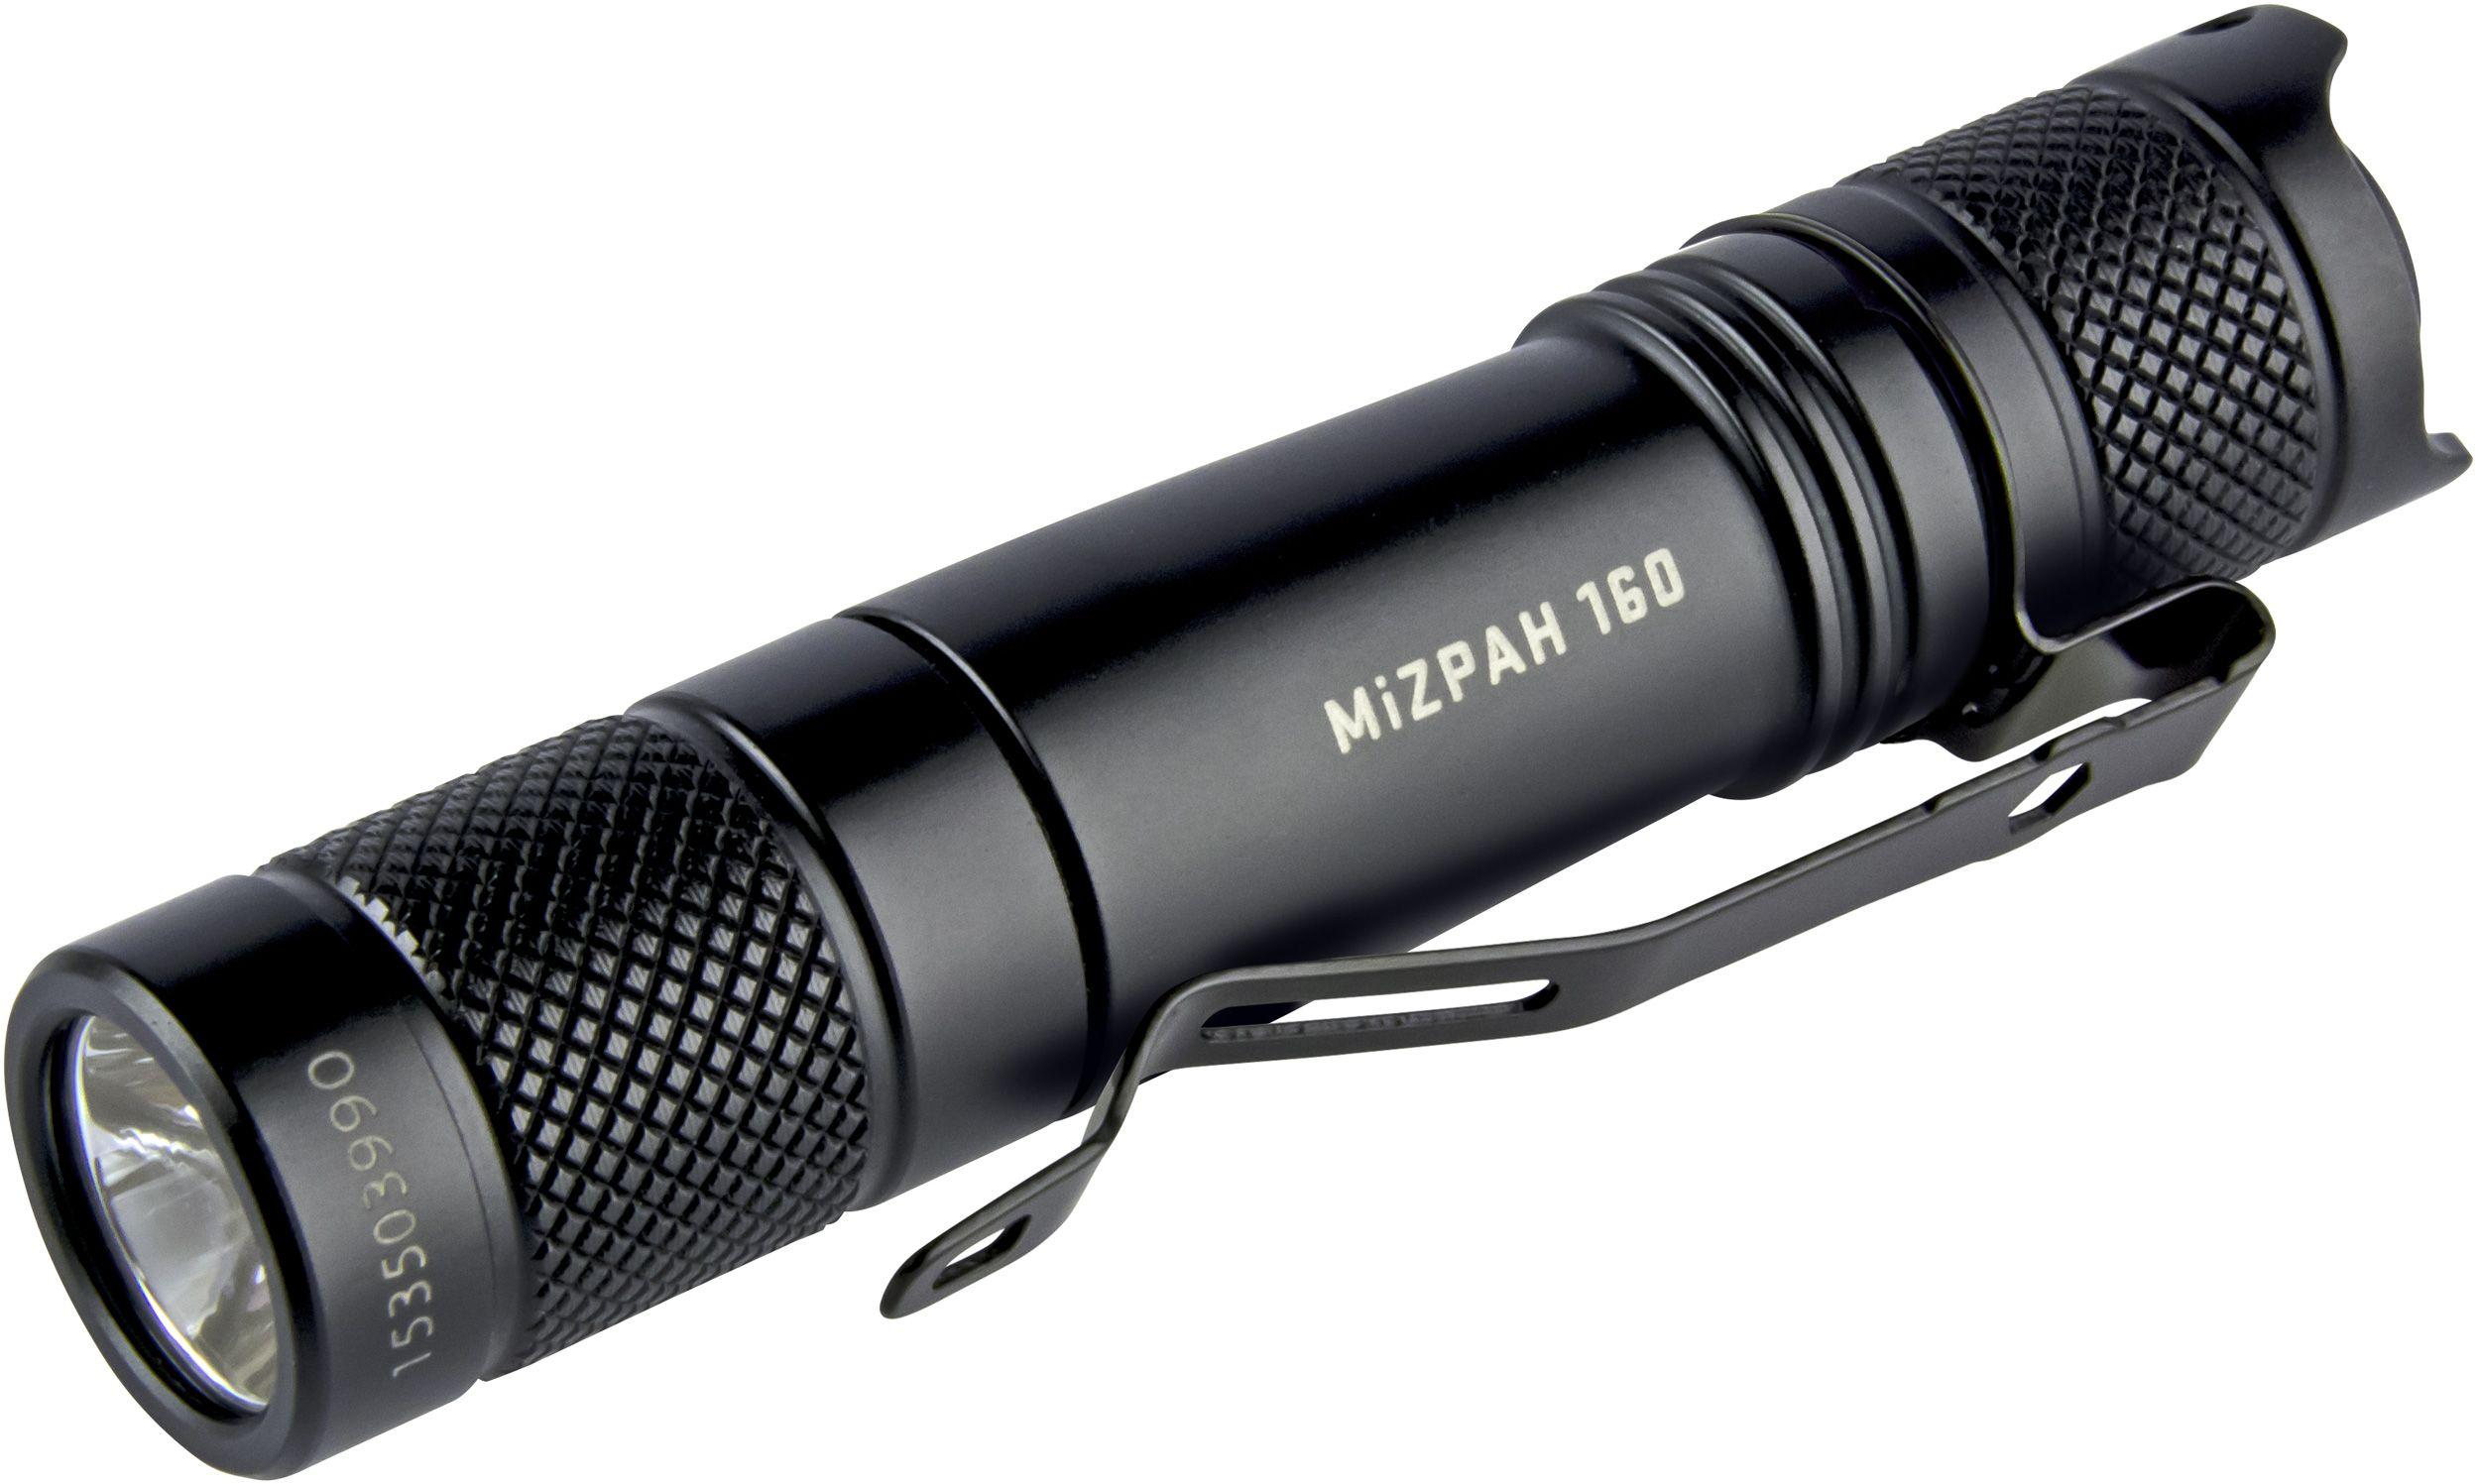 Factor Equipment FM002 MiZPAH 160 Compact LED Flashlight, Black, 160 Max Lumens